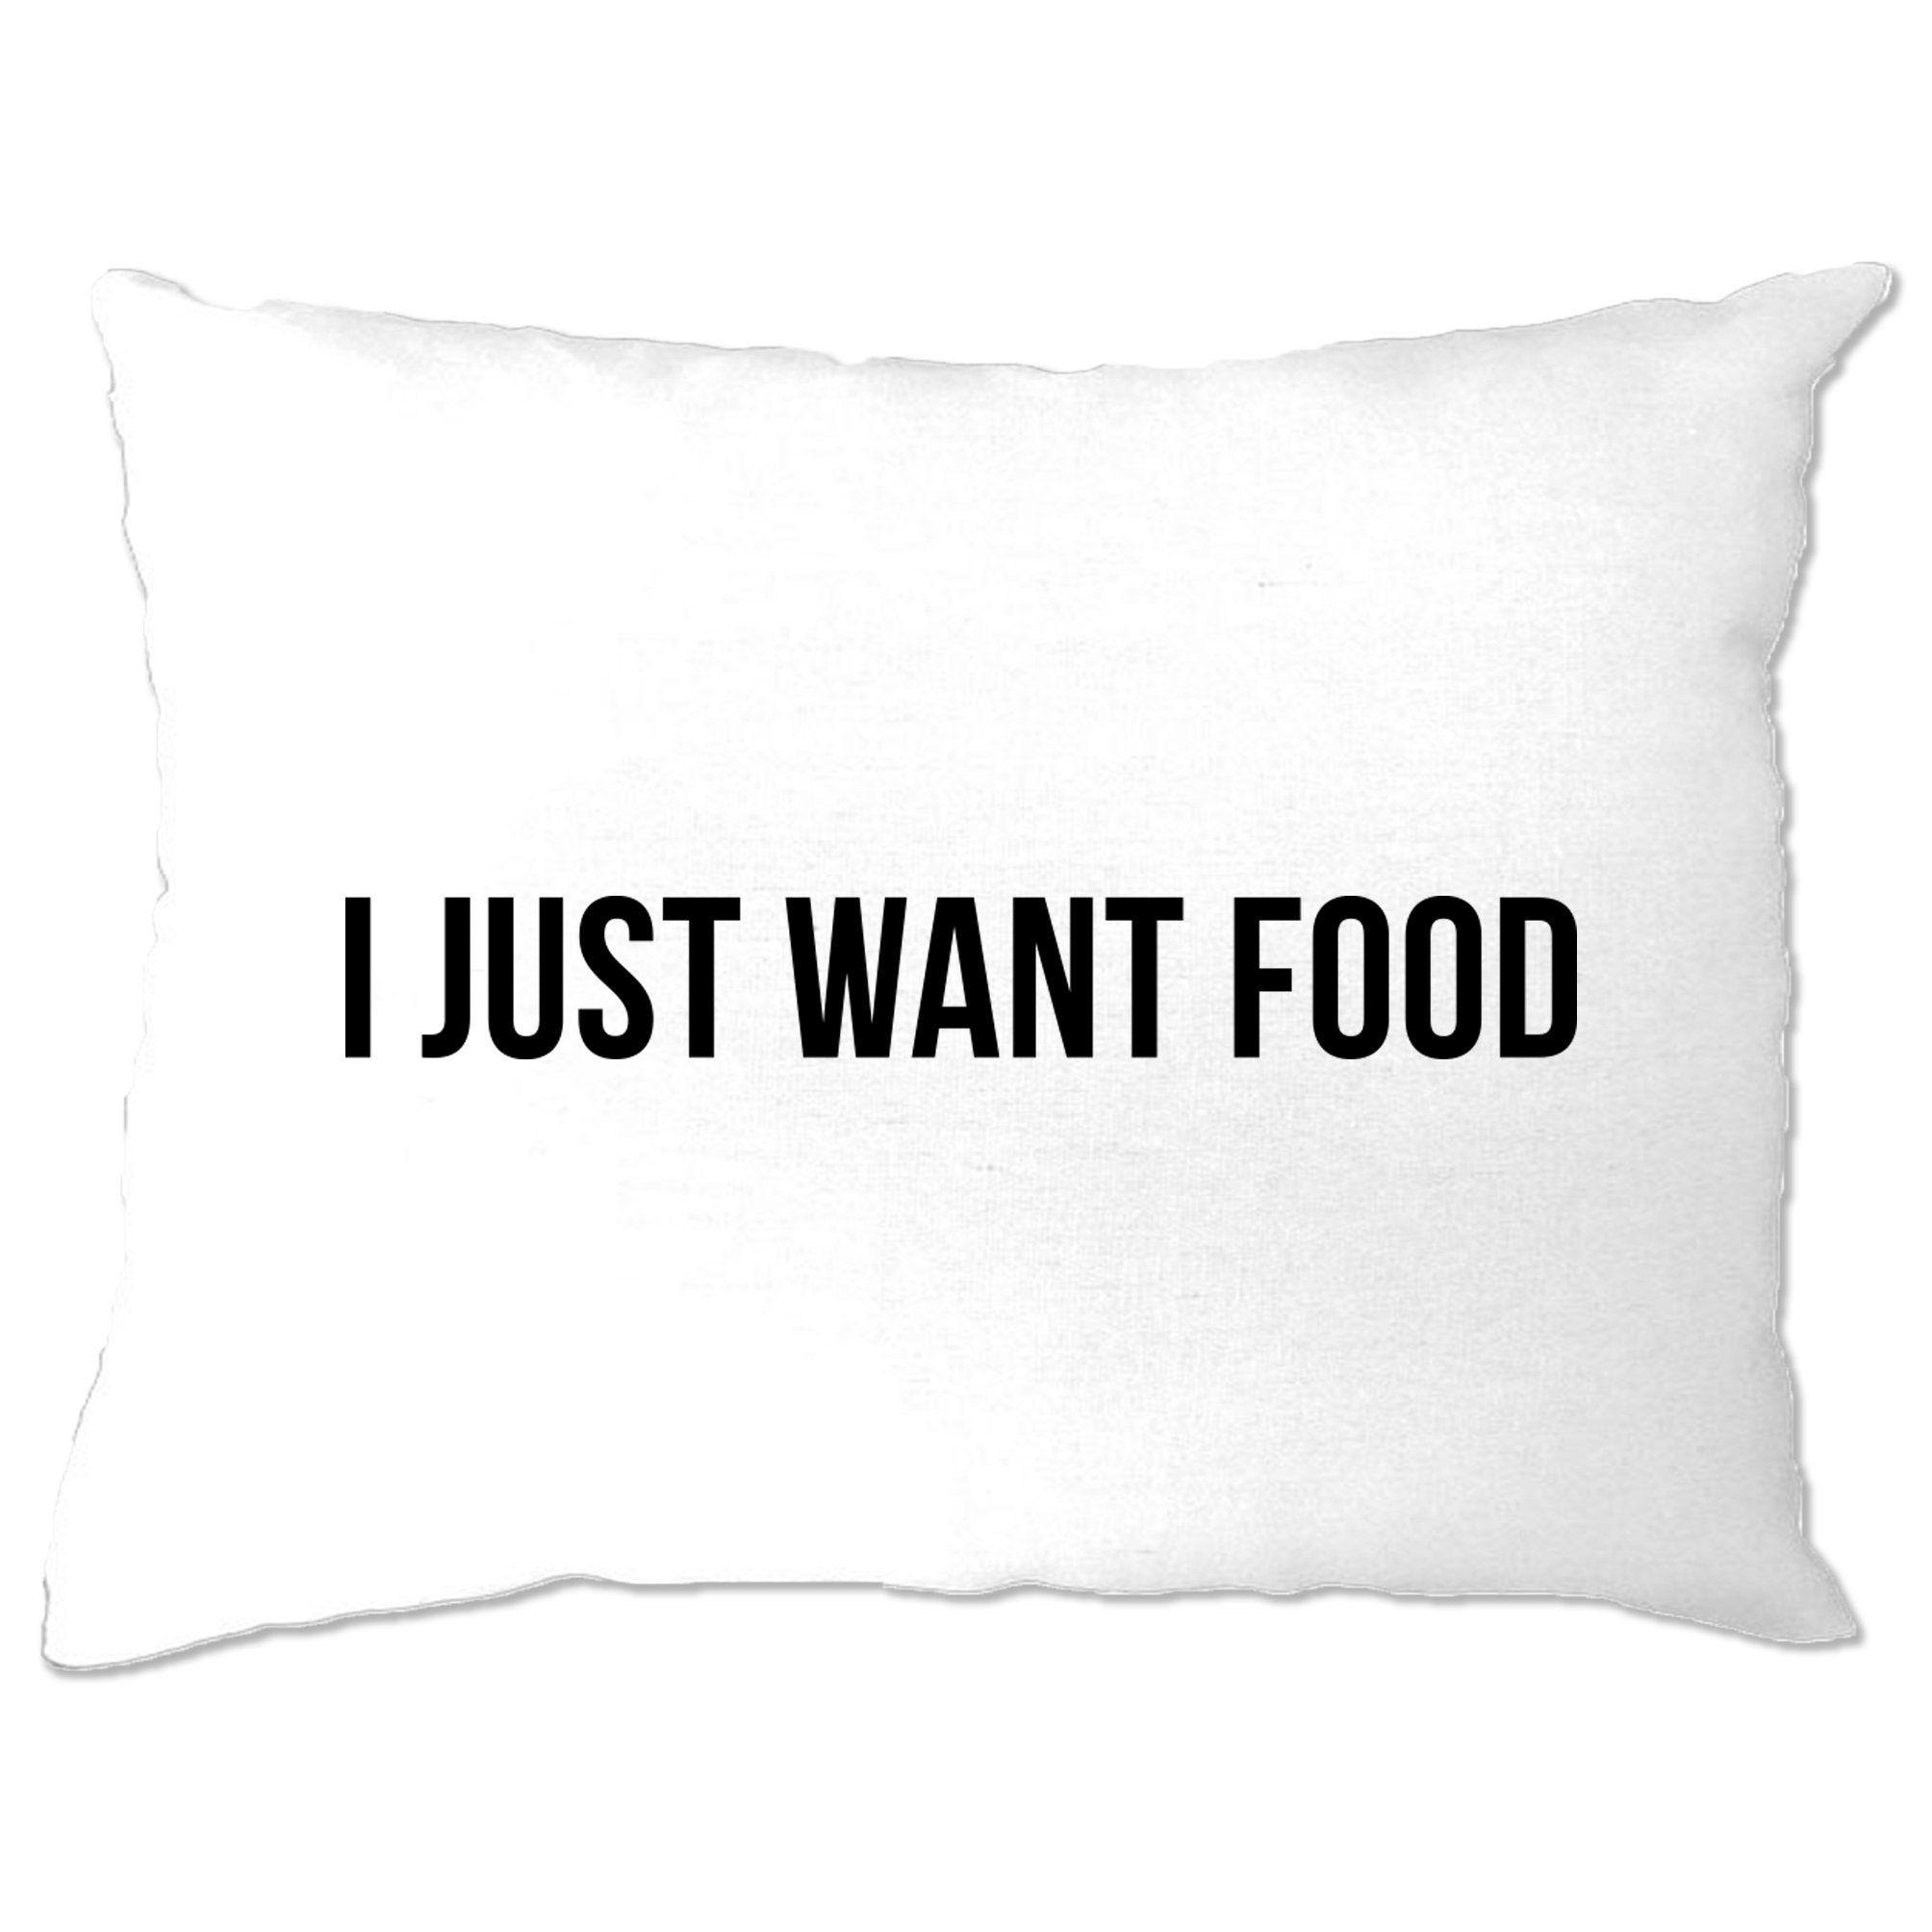 Novelty Pillow Case I Just Want Food Slogan